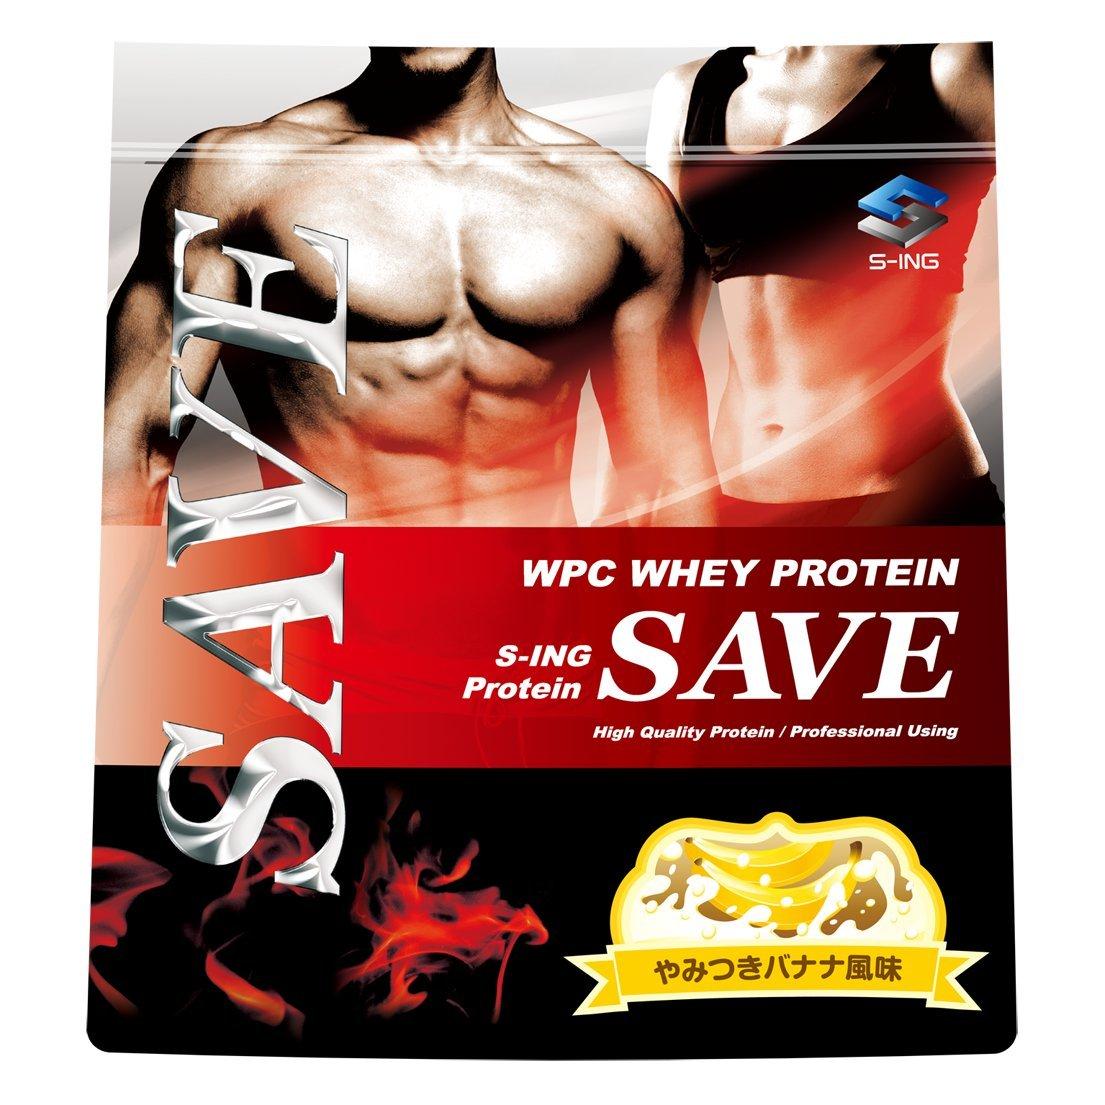 SAVE プロテイン やみつきバナナ風味 5kg 美味しいWPC ホエイプロテイン 乳酸菌バイオペリンエンザミン酵素配合 B07DVF6TLG